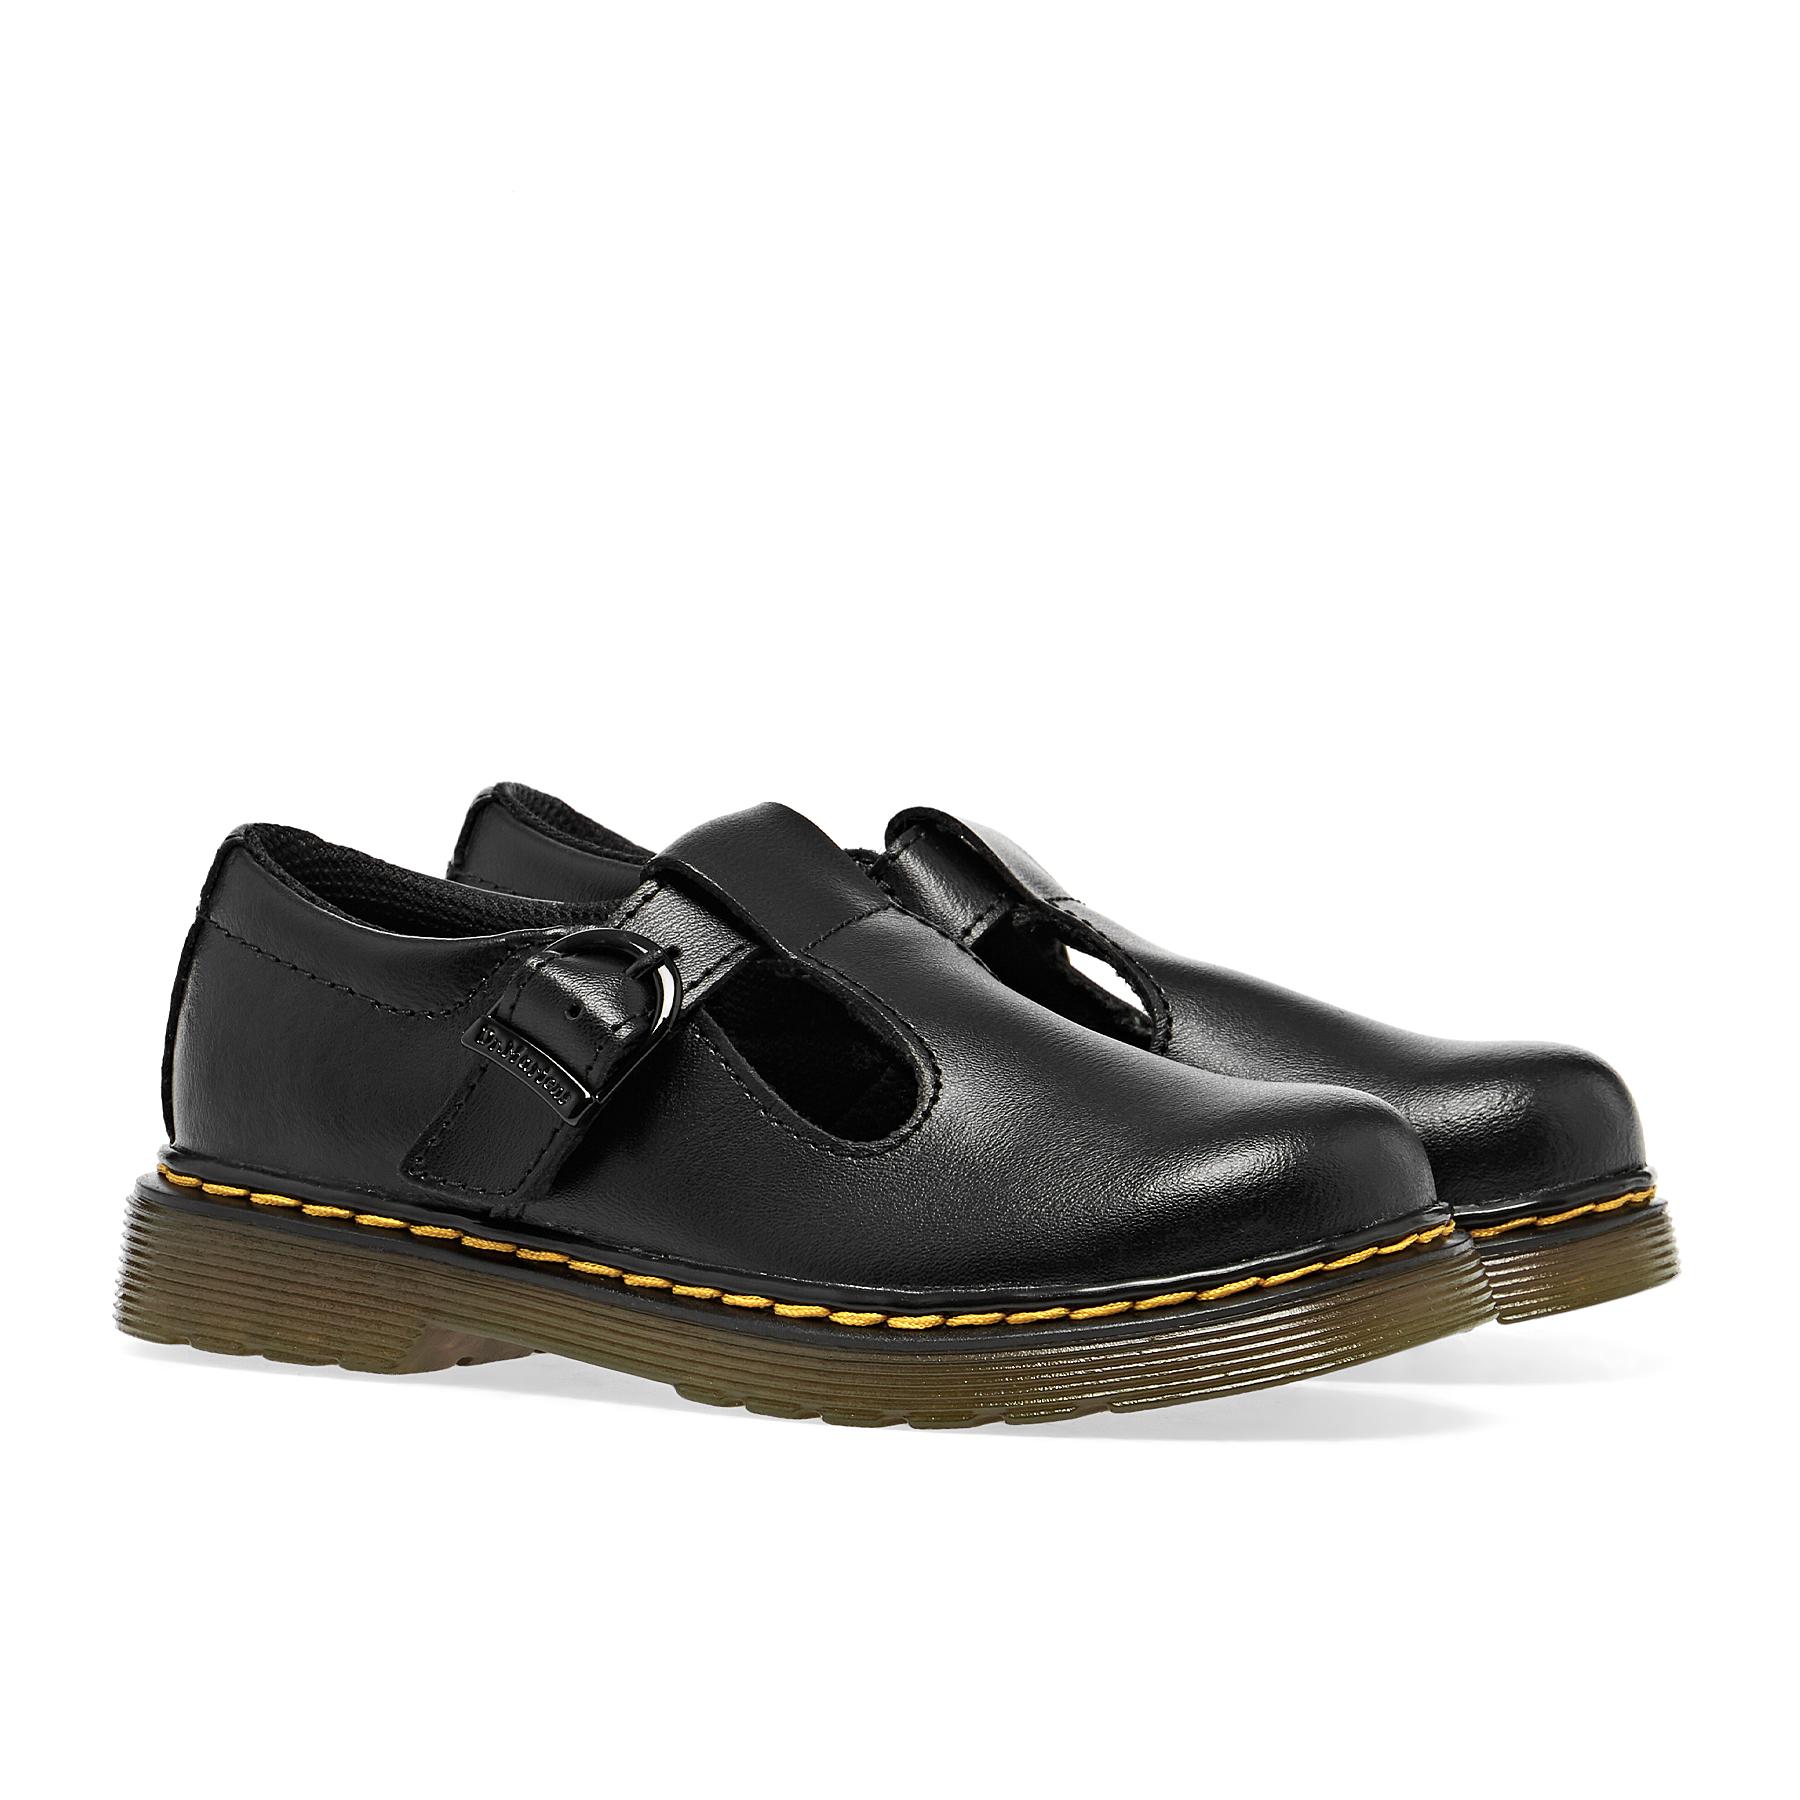 Dr Martens Polley Brogue T Kids Shoes